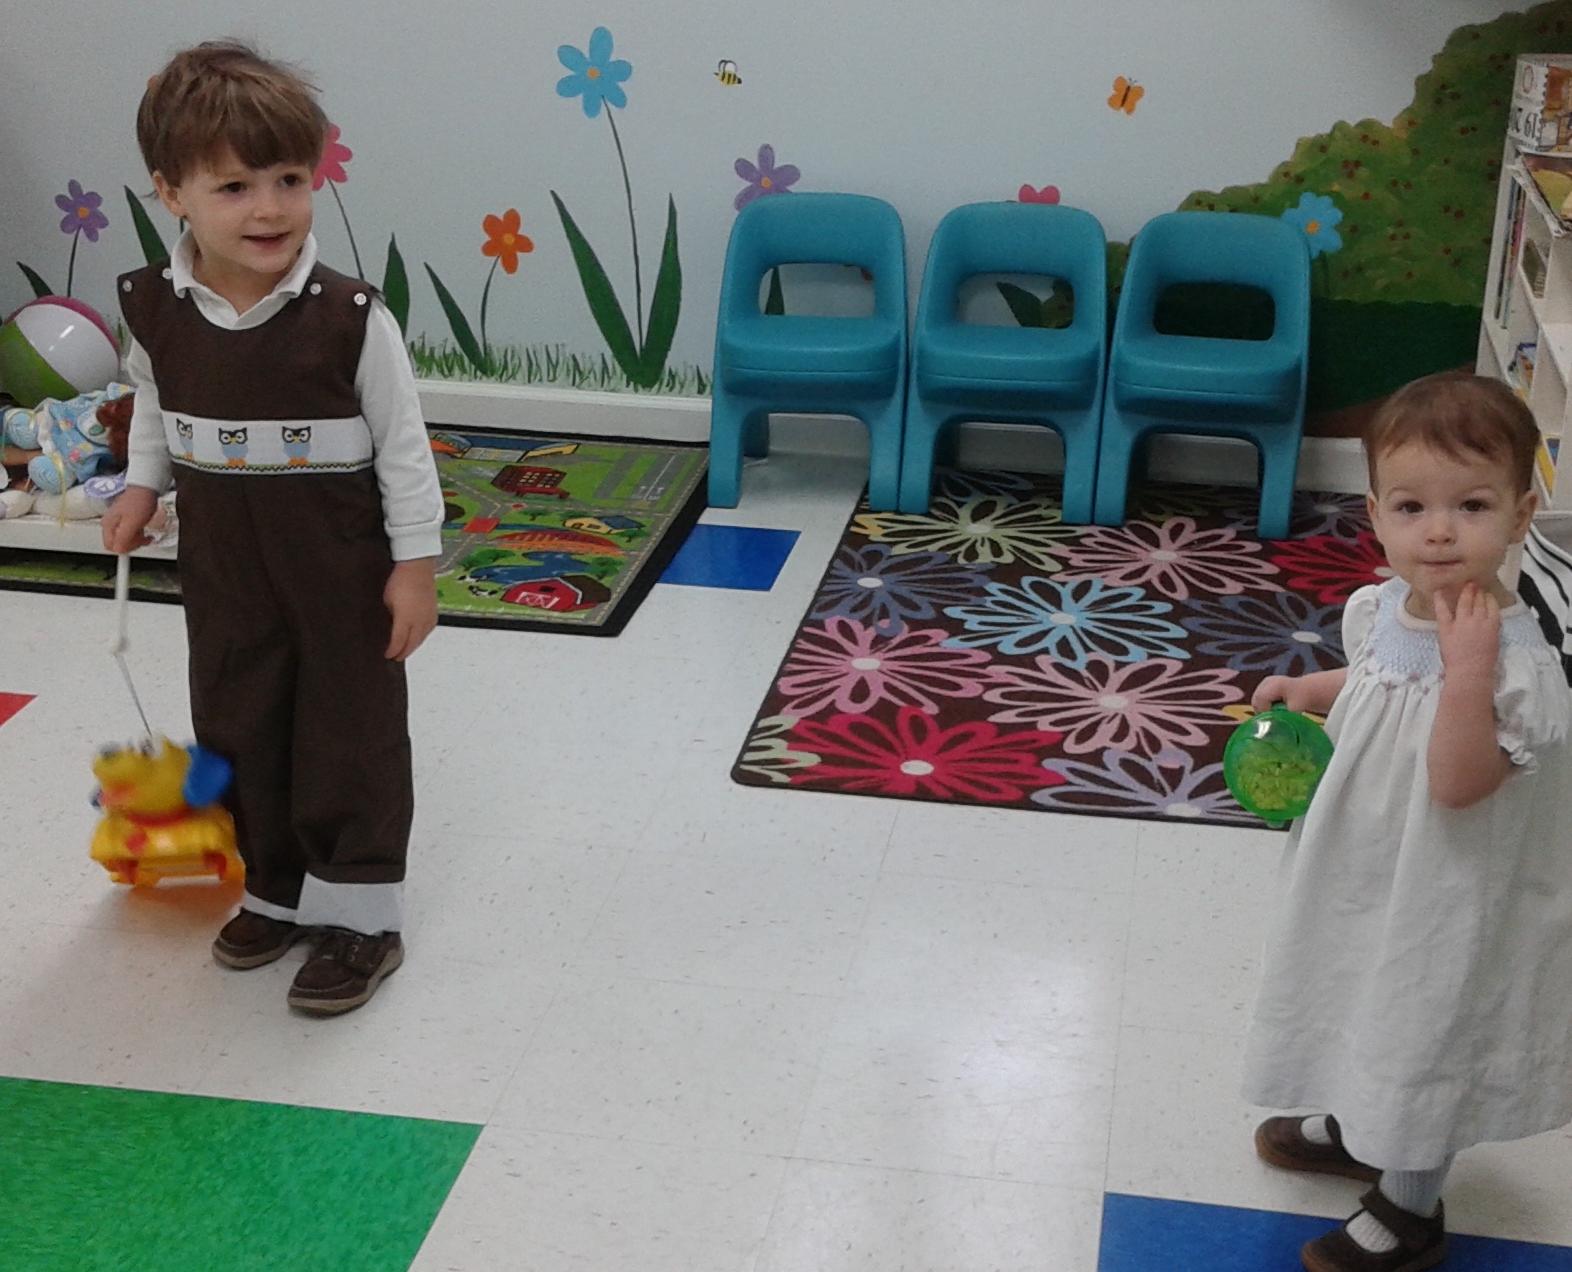 Lots of fun in the nursery.